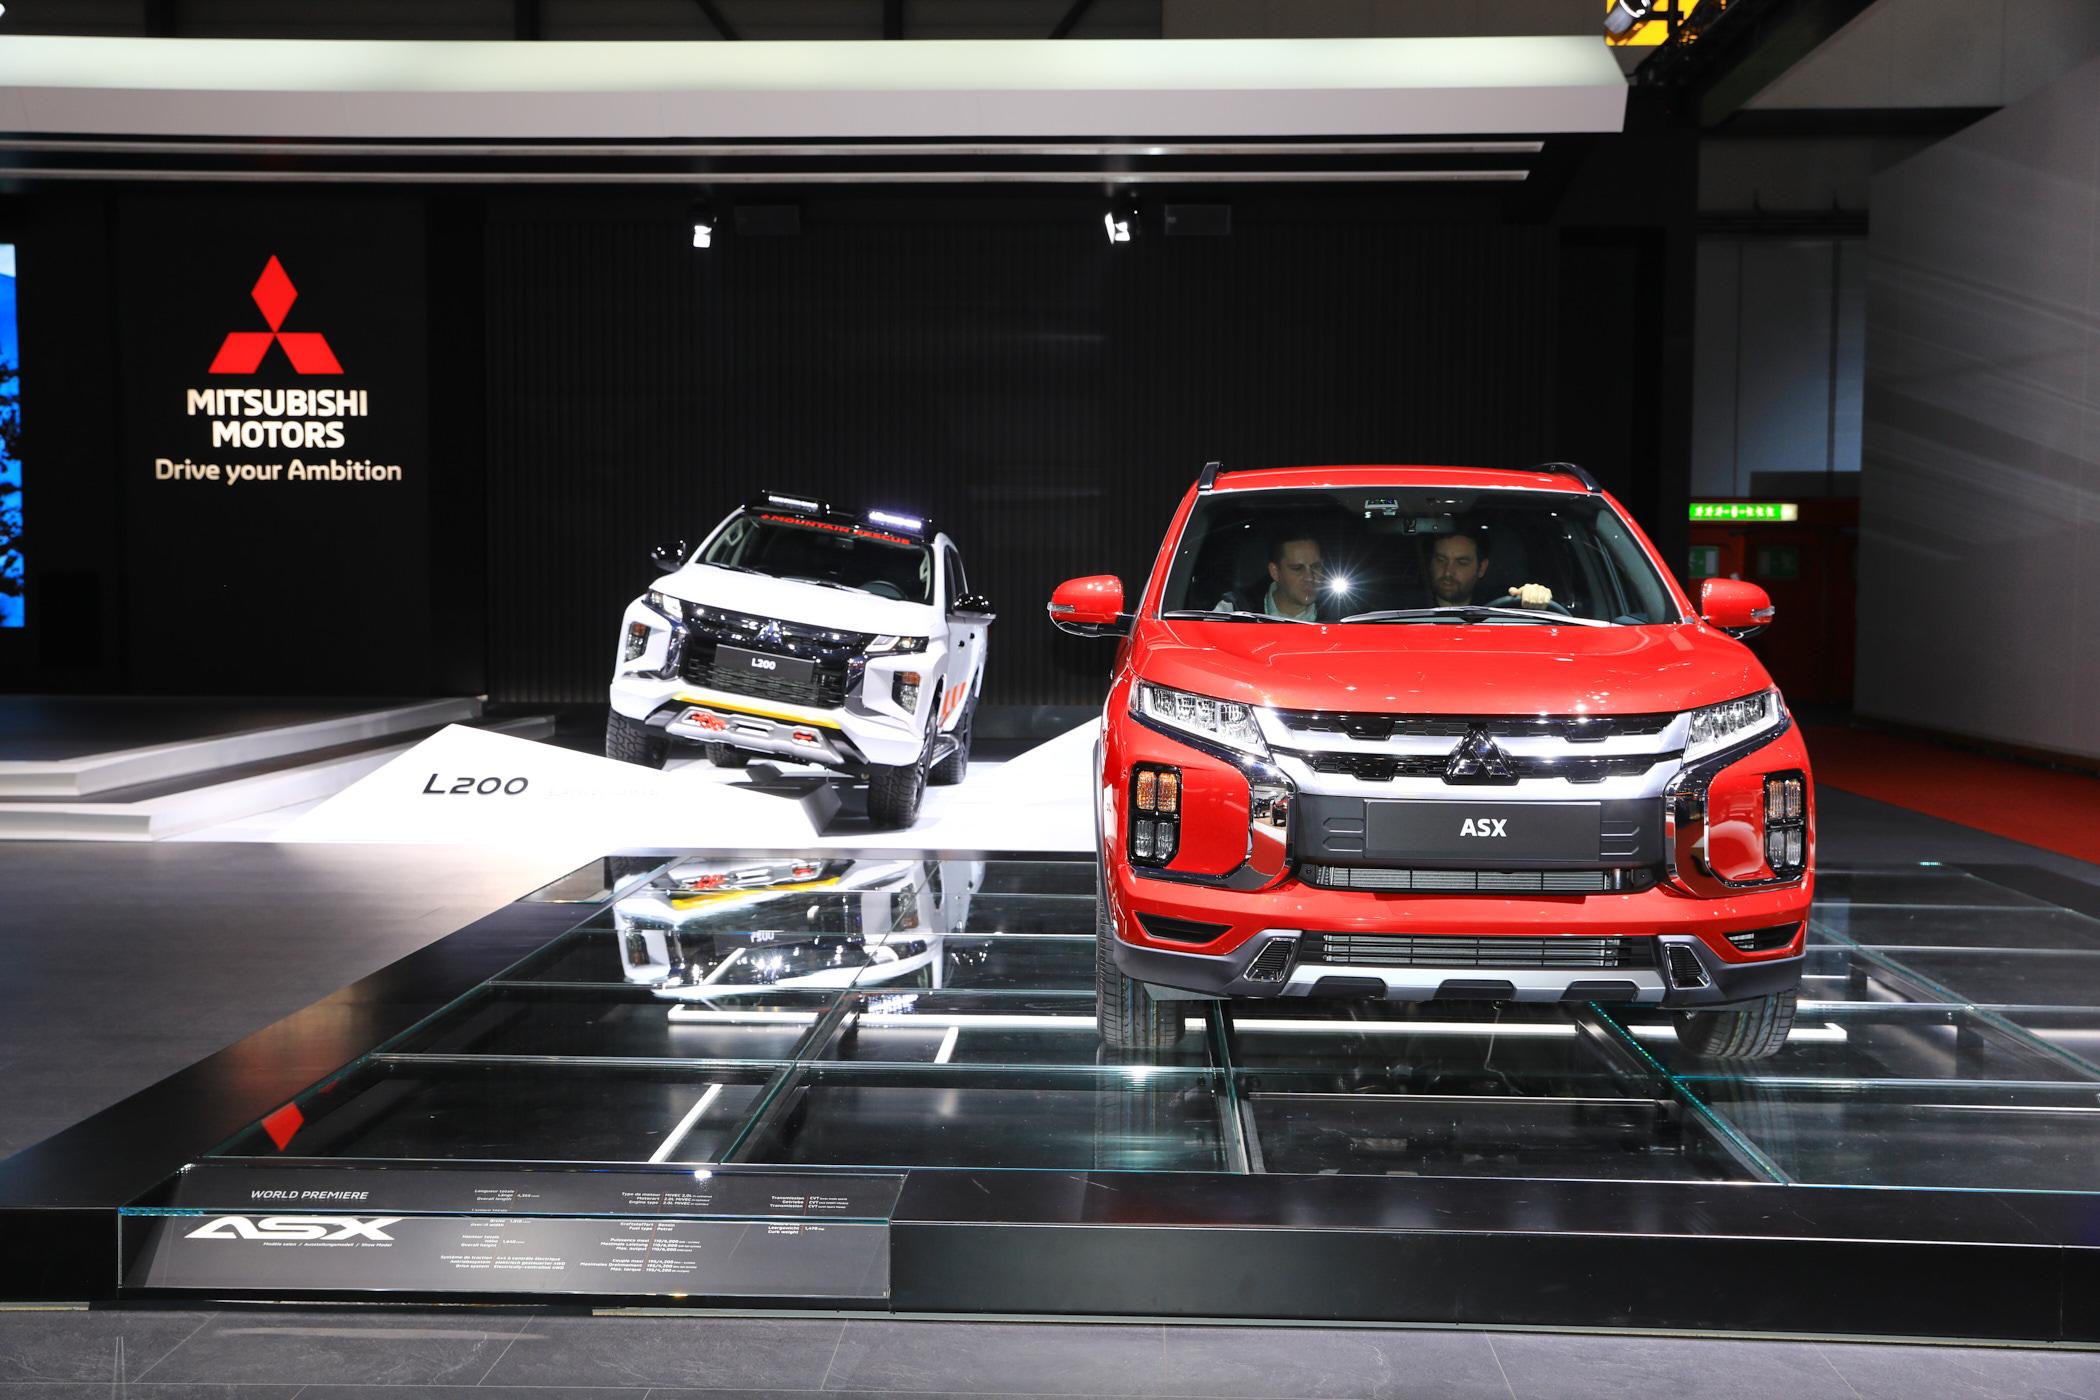 2020-mitsubishi-asxoutlander-sport-1.jpg